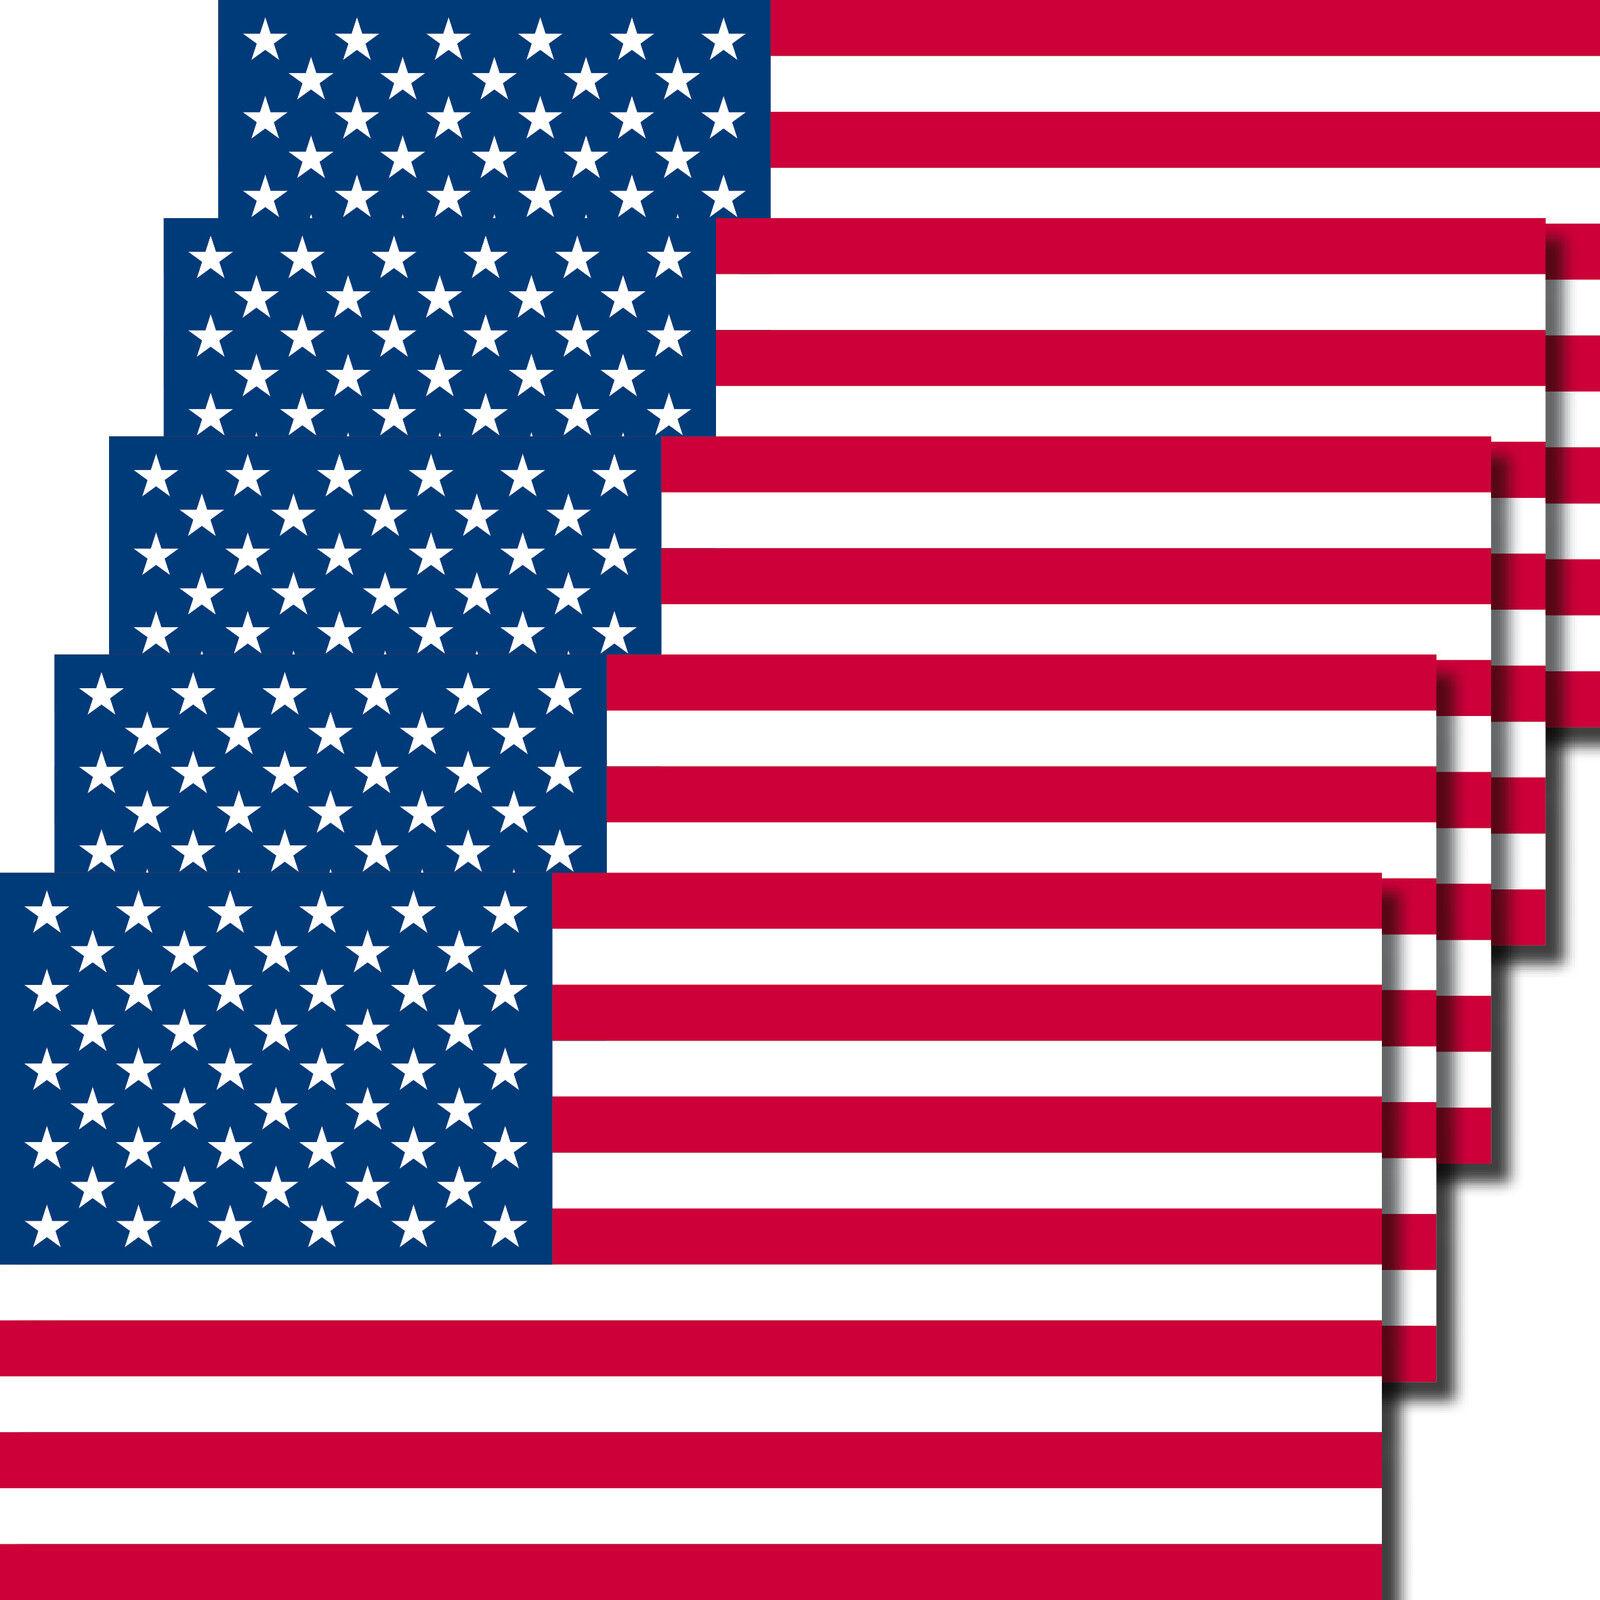 5 Aufkleber 6,5cm Sticker USA Amerika US Flag Fußball Fan EM WM Flagge Fahne